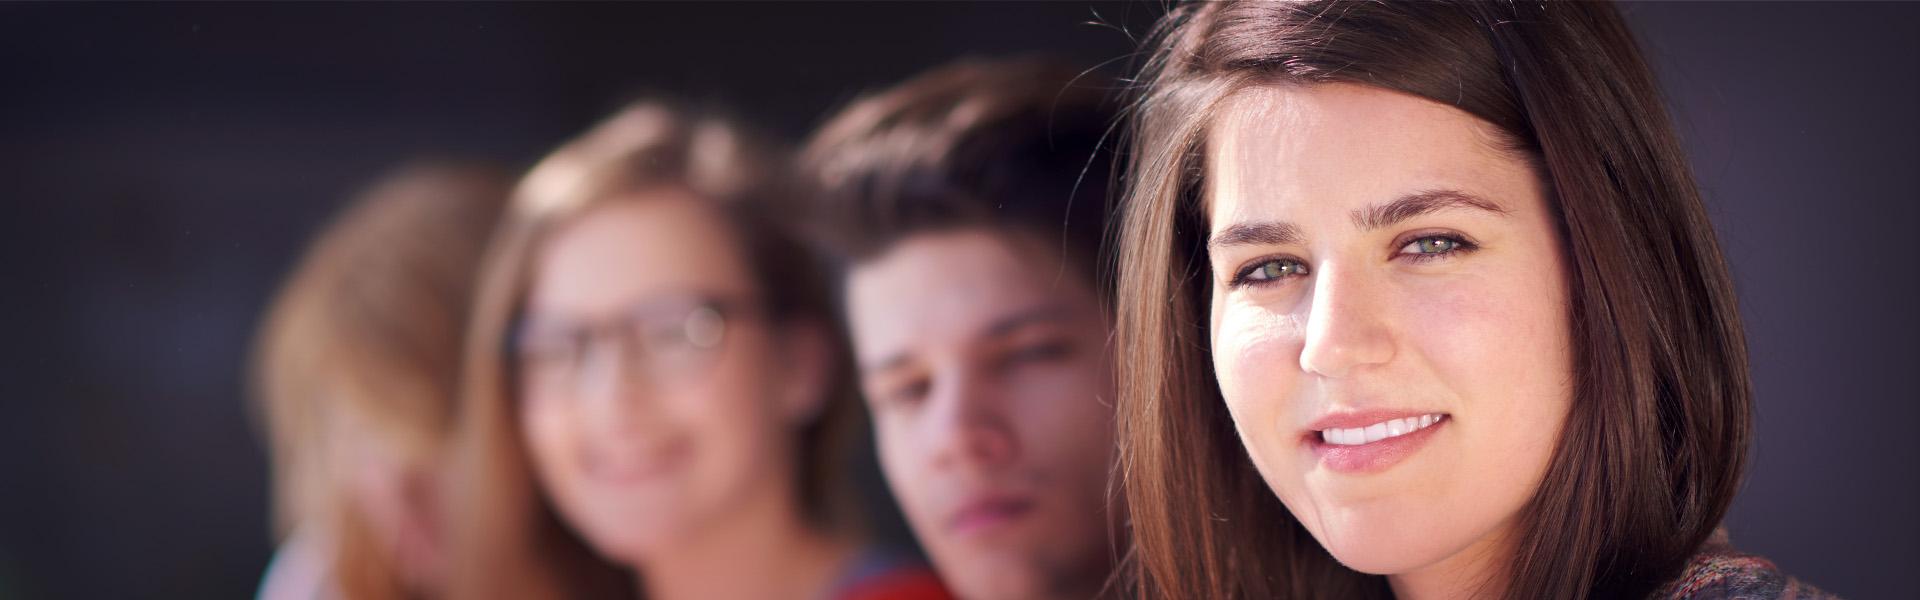 boys-girls-home-smiling teen